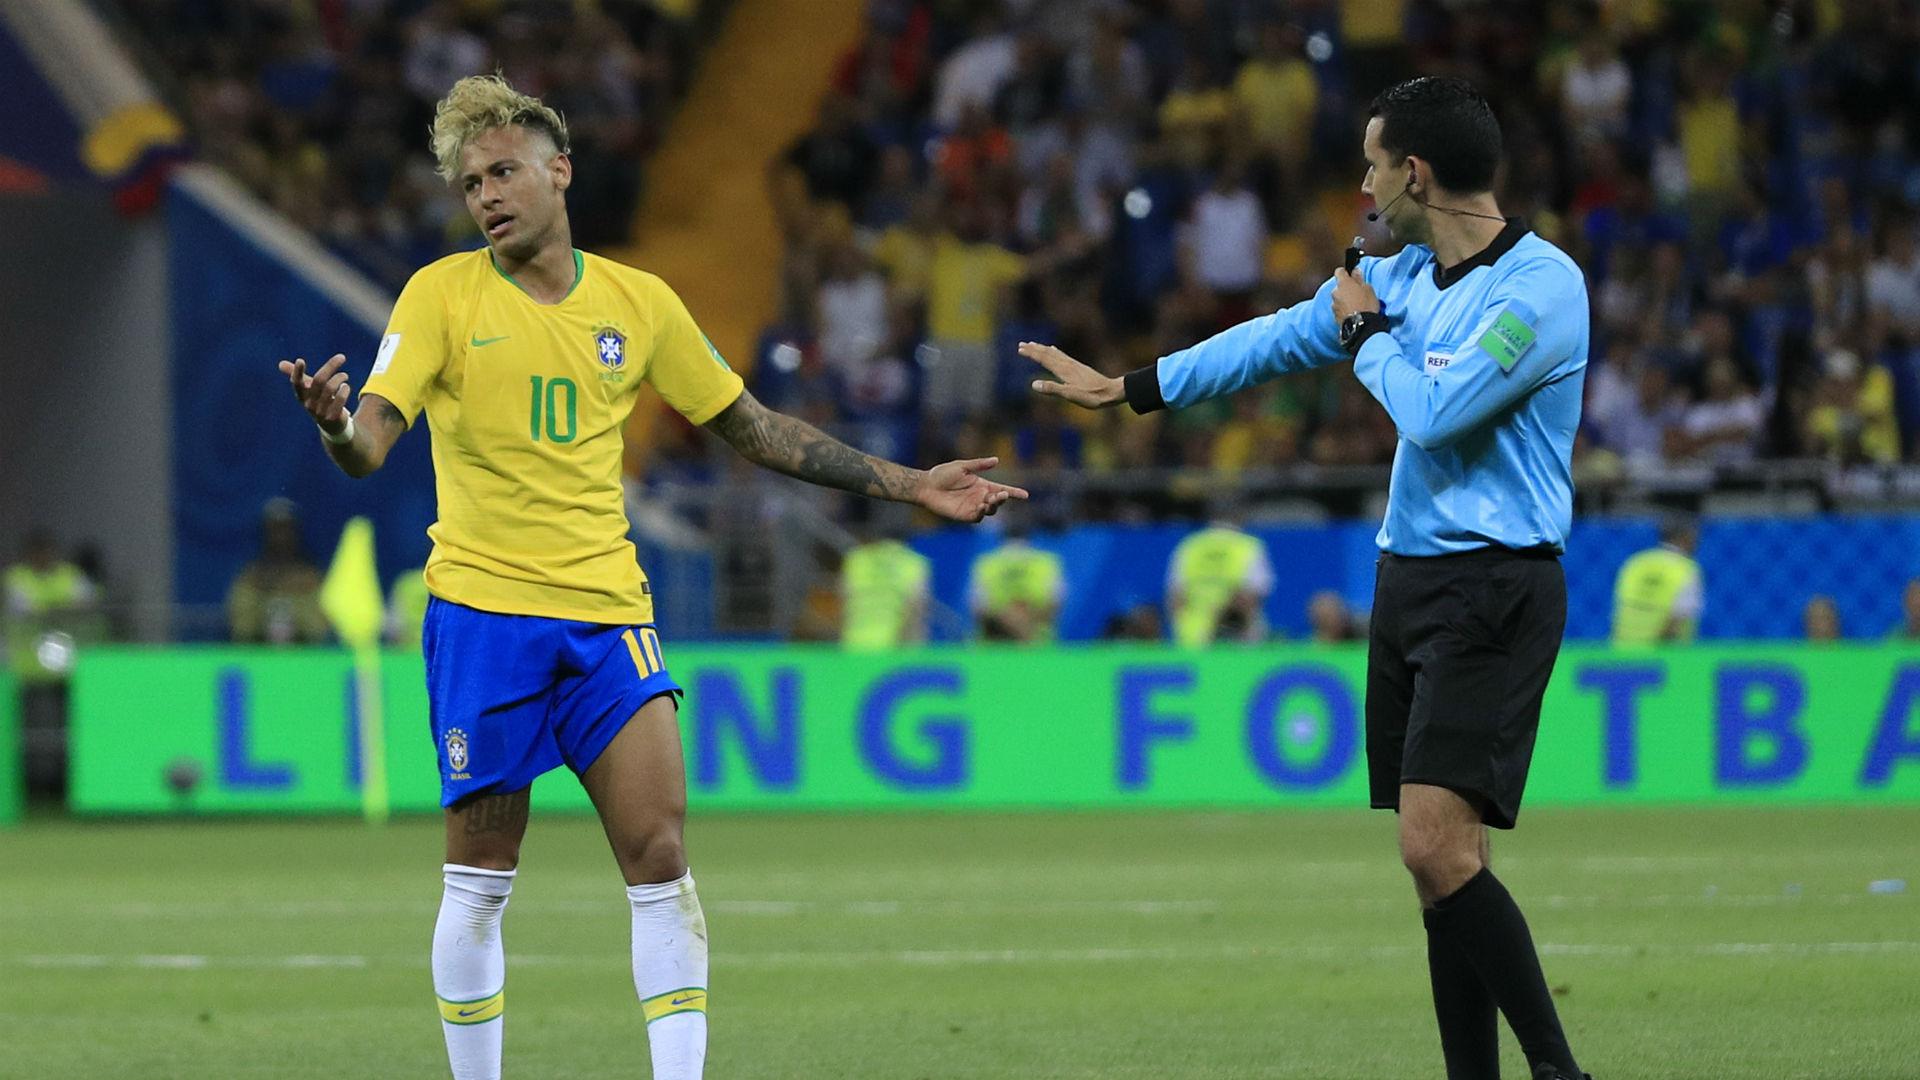 Neymar-cropped_yac9fhpj3jcuz2jcqcr5ou5y